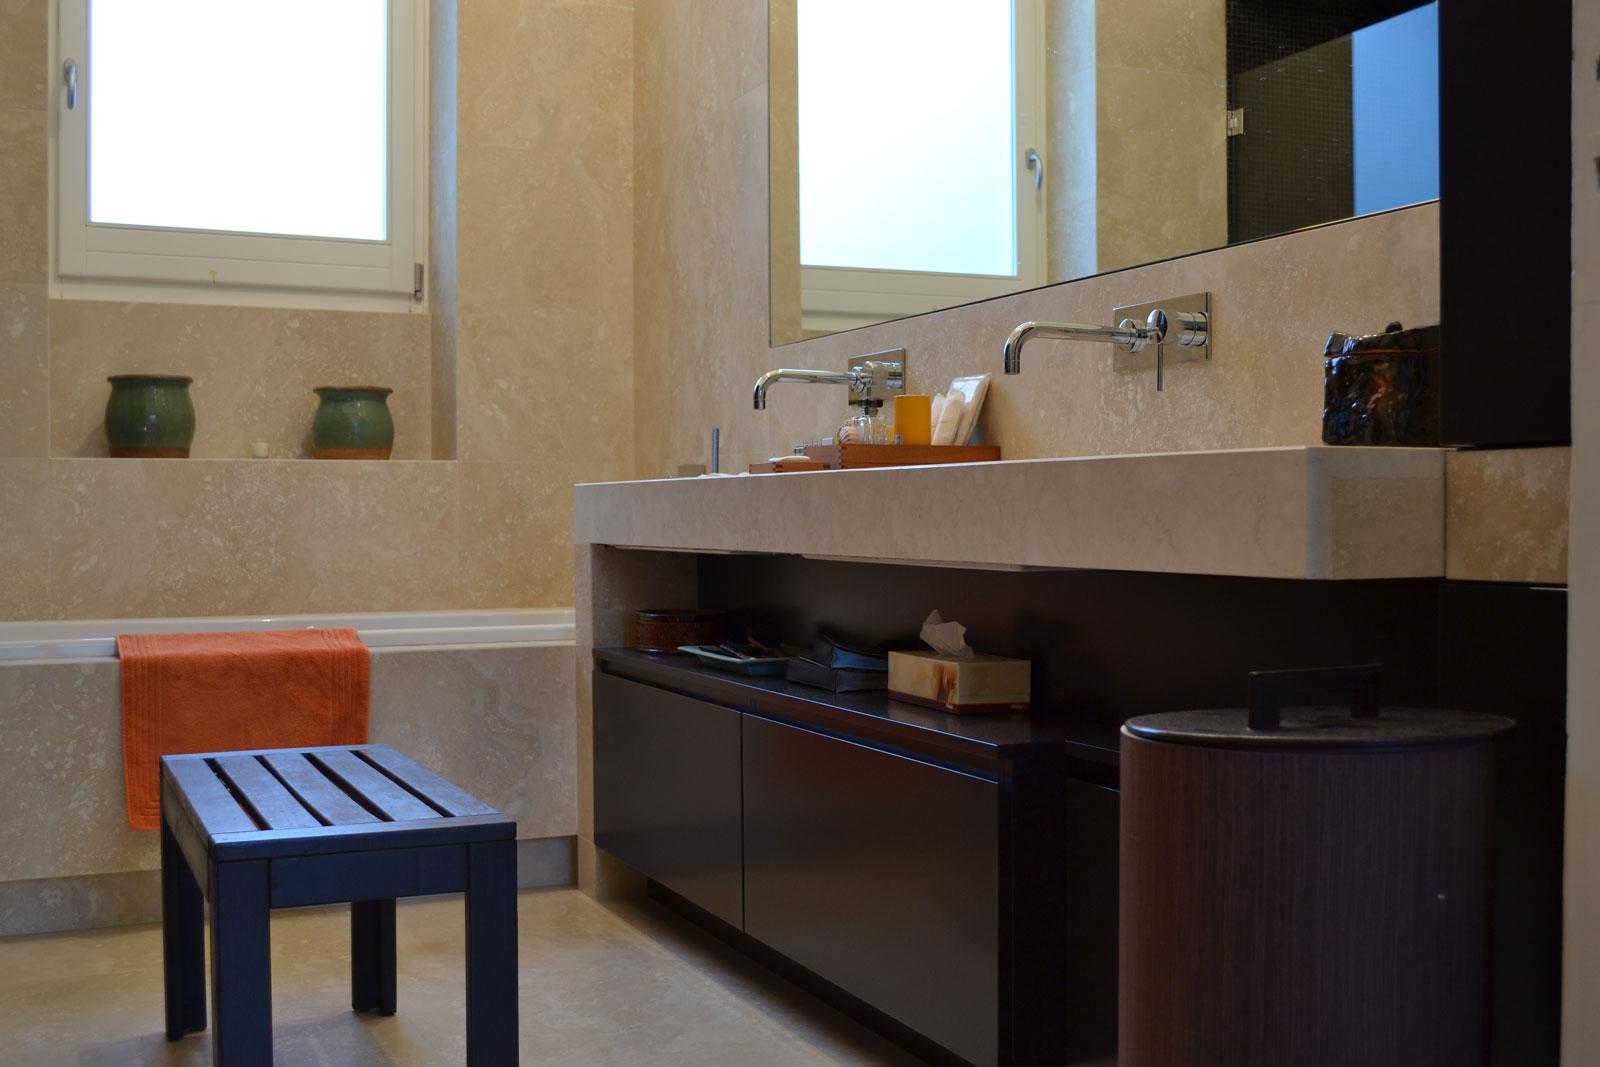 Mobili bagno in legno rovere tinto weng napoli - Mobili bagno napoli ...